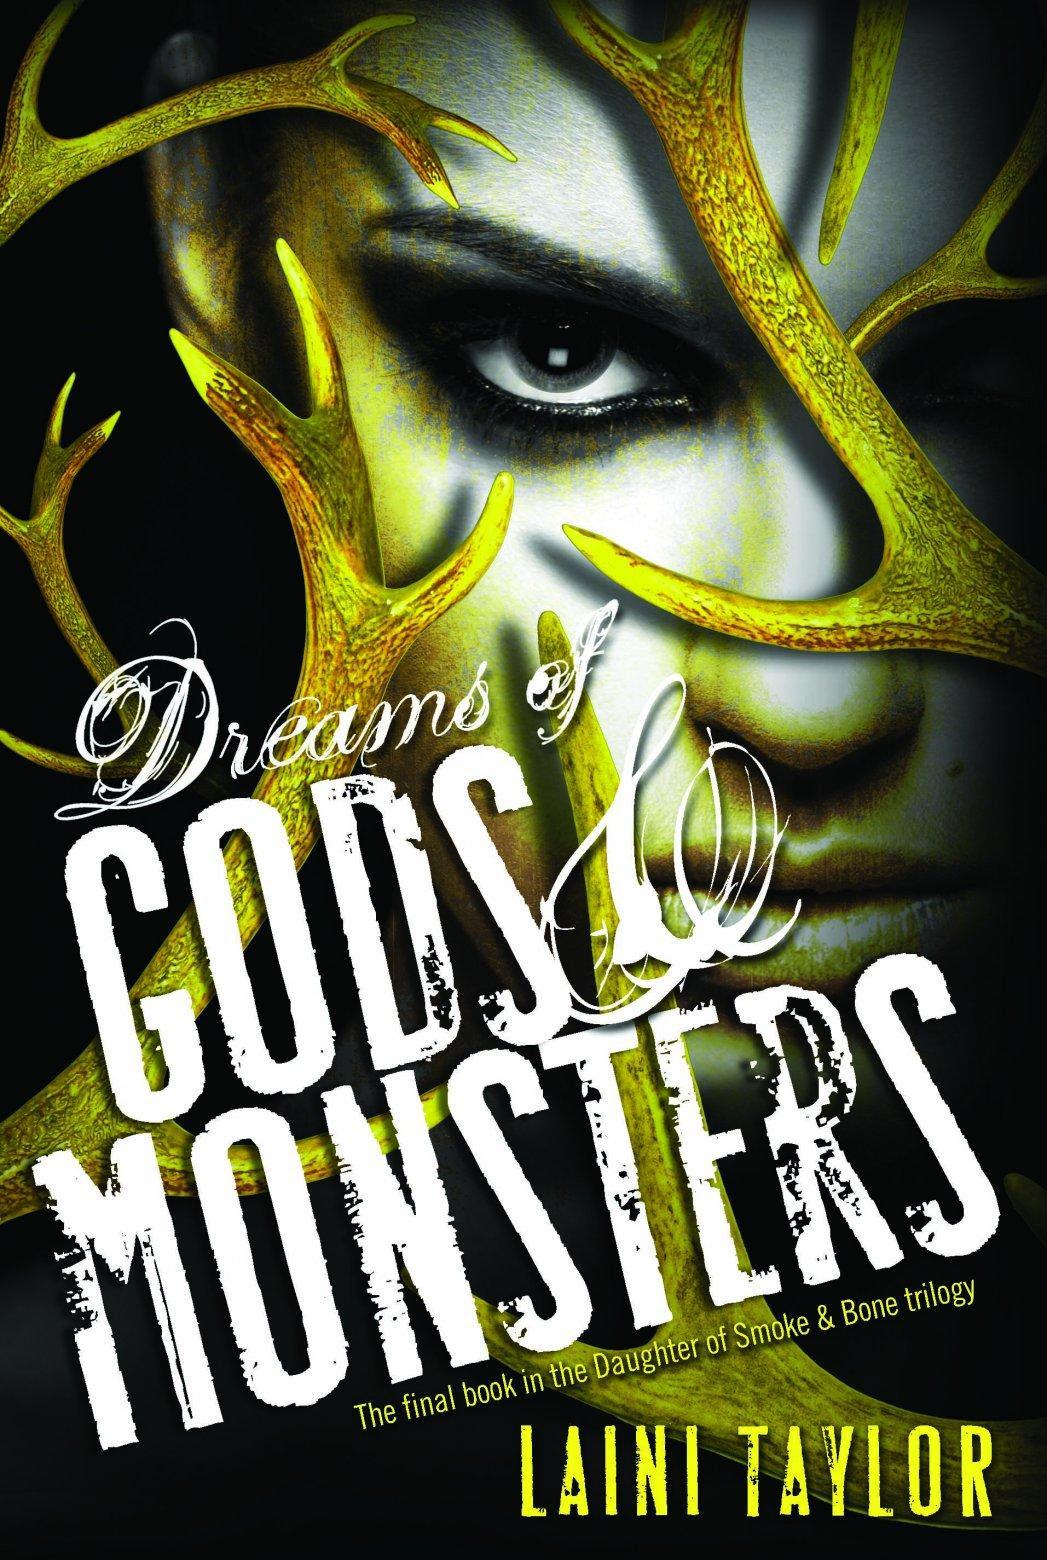 Portada Revelada: Dreams of Gods & Monsters (Daughter of Smoke & Bone, #3) de Laini Taylor